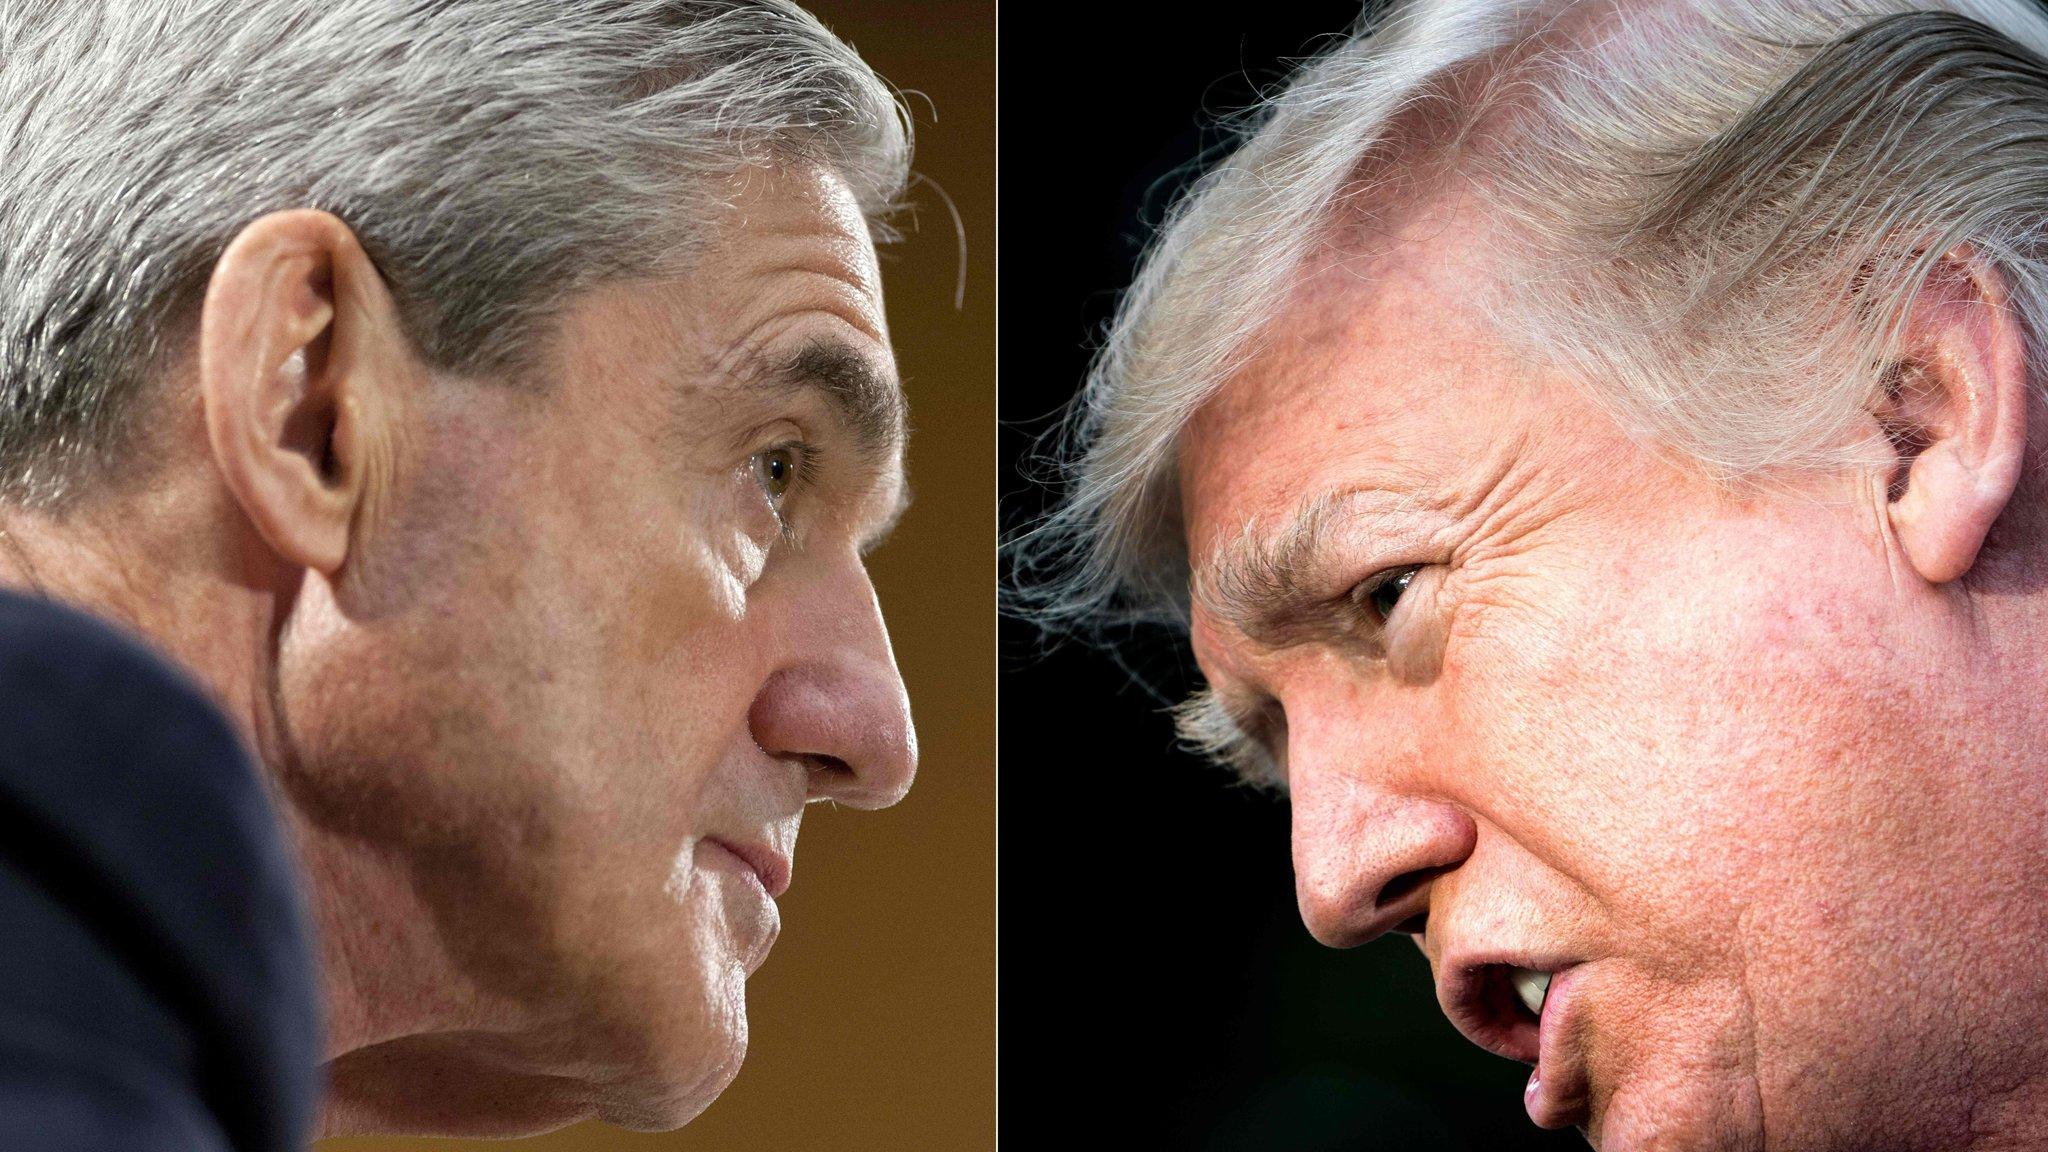 Trump's plan to fire Mueller fuels Russia suspicions